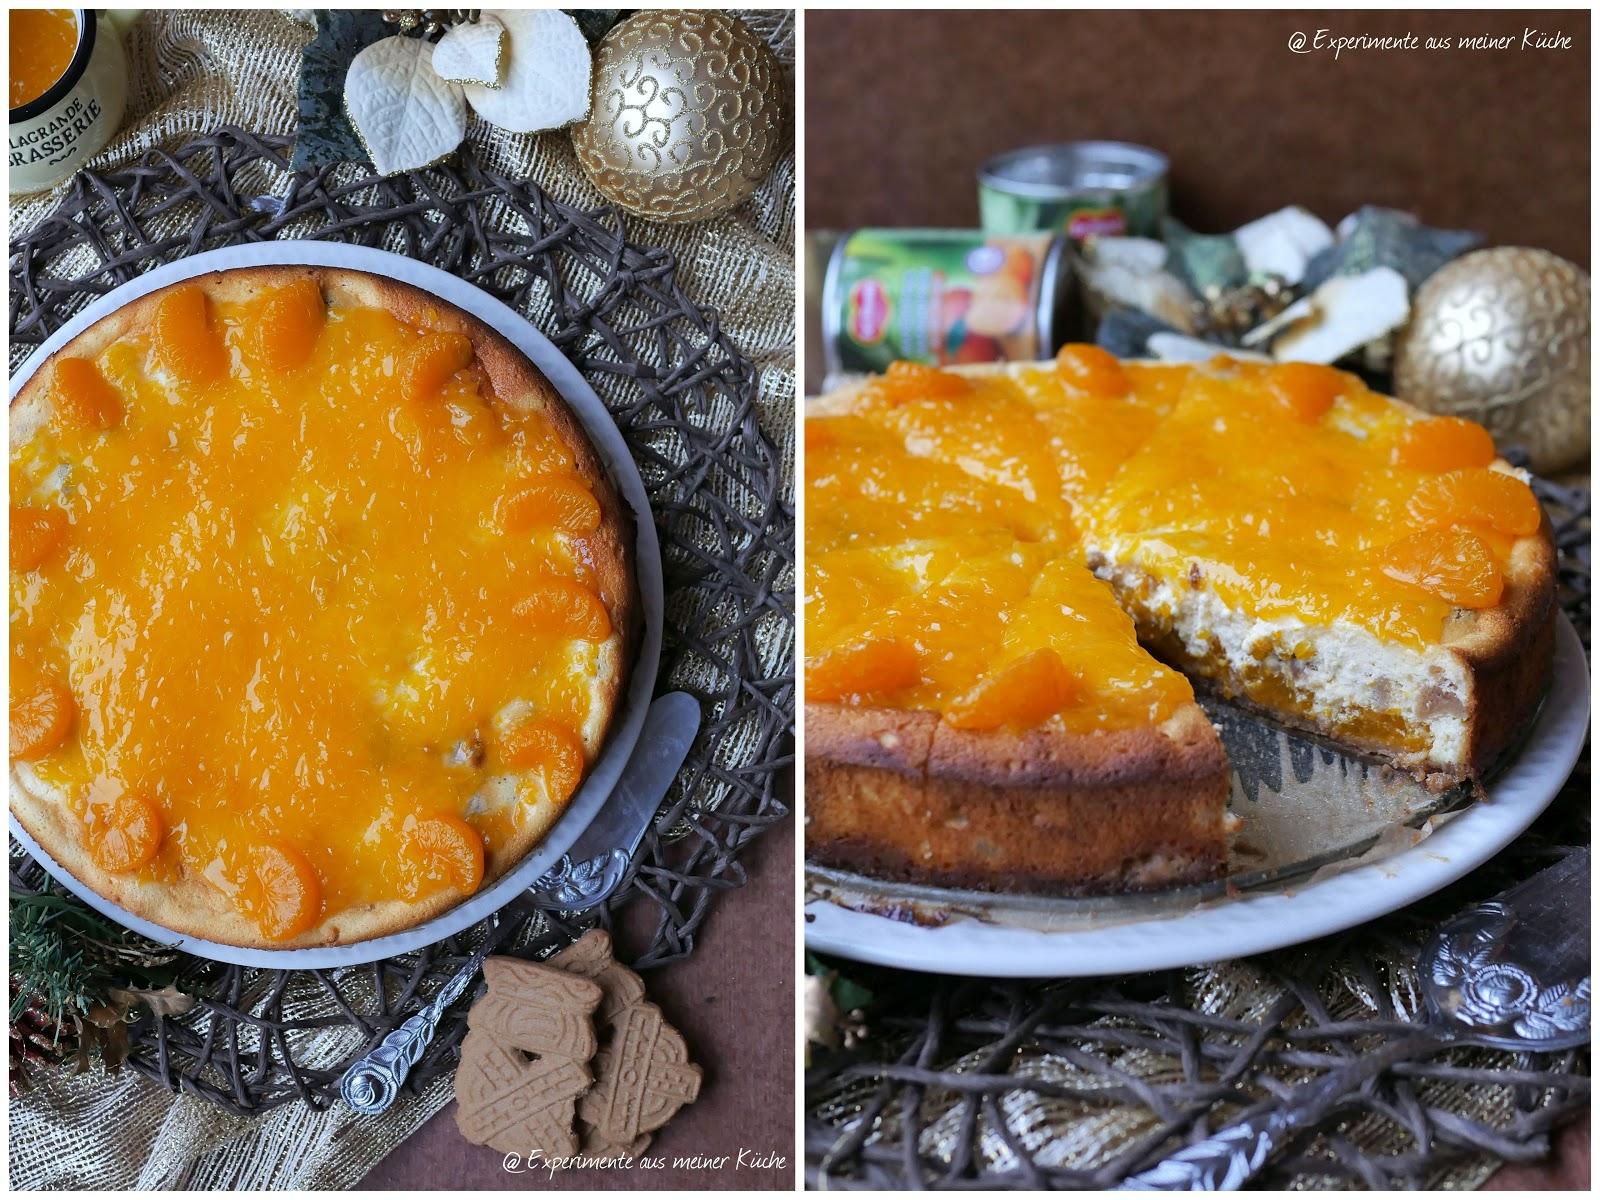 Experimente aus meiner Küche: Mandarinen-Spekulatius-Cheesecake